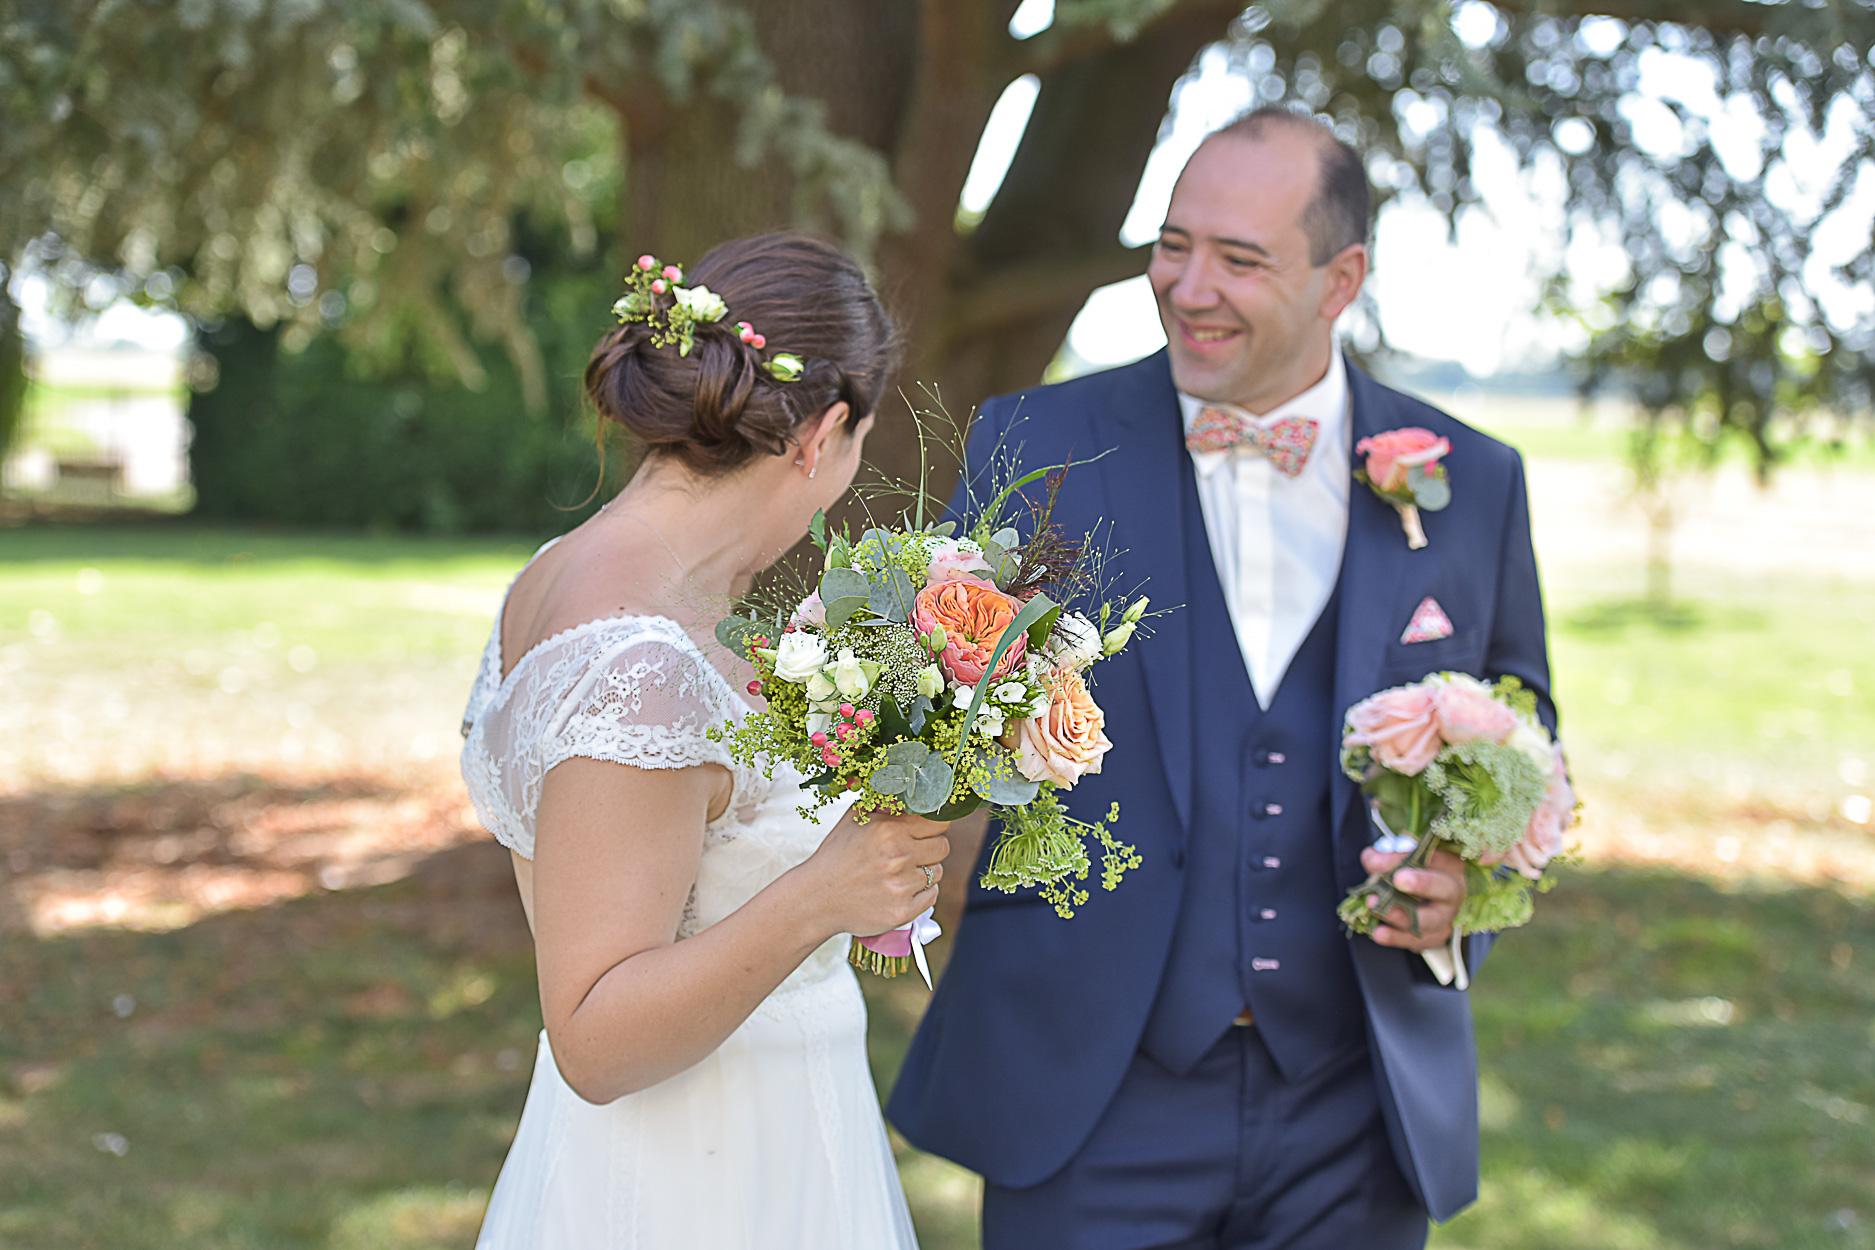 photographe-mariage-ile-de-france-portraits-maries